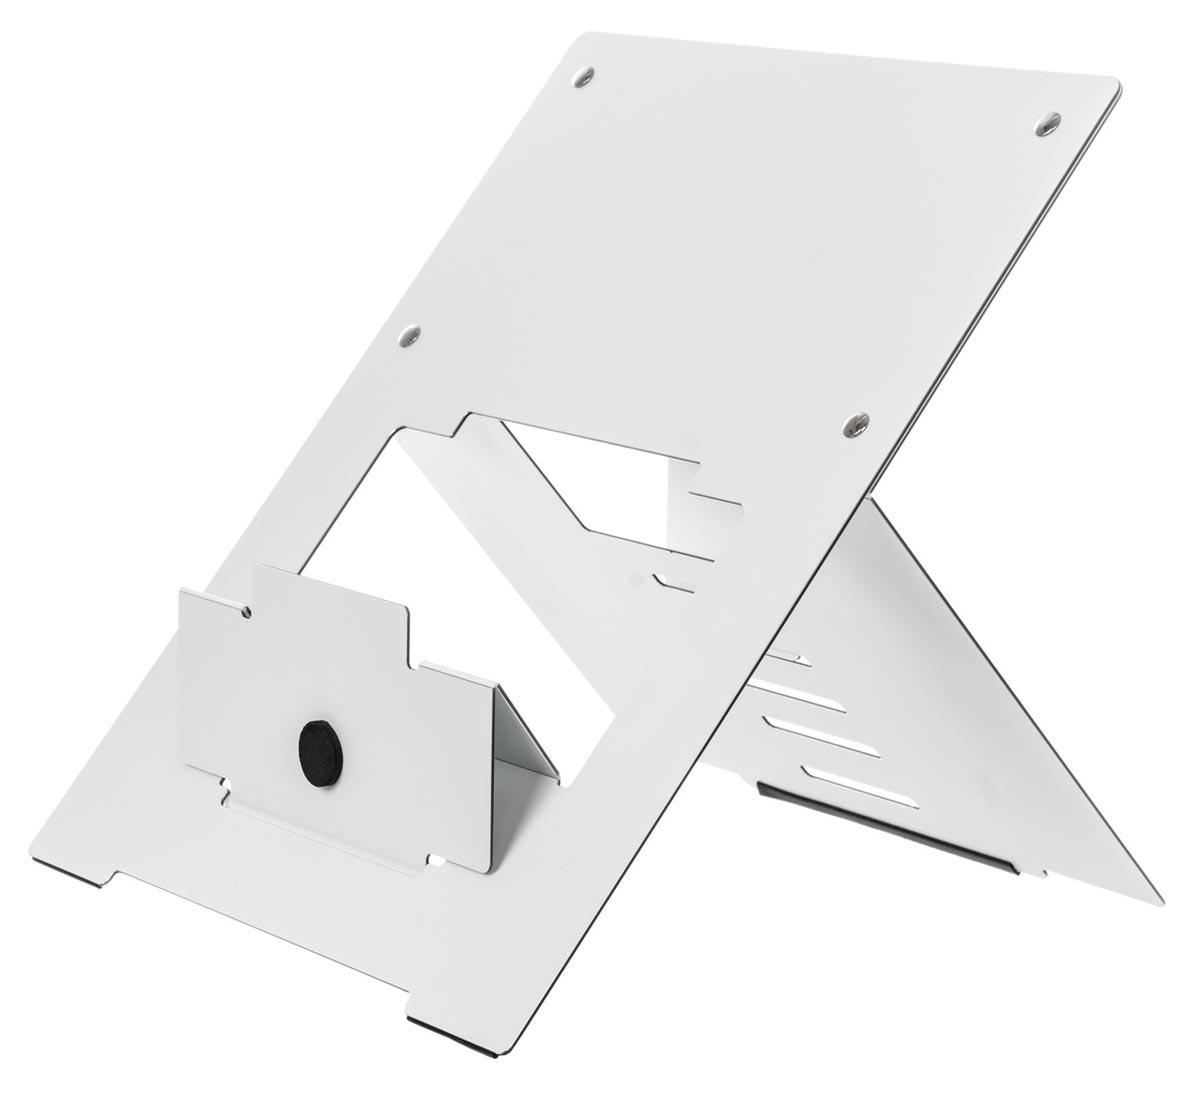 R-Go Riser Flexible laptopstandaard, wit